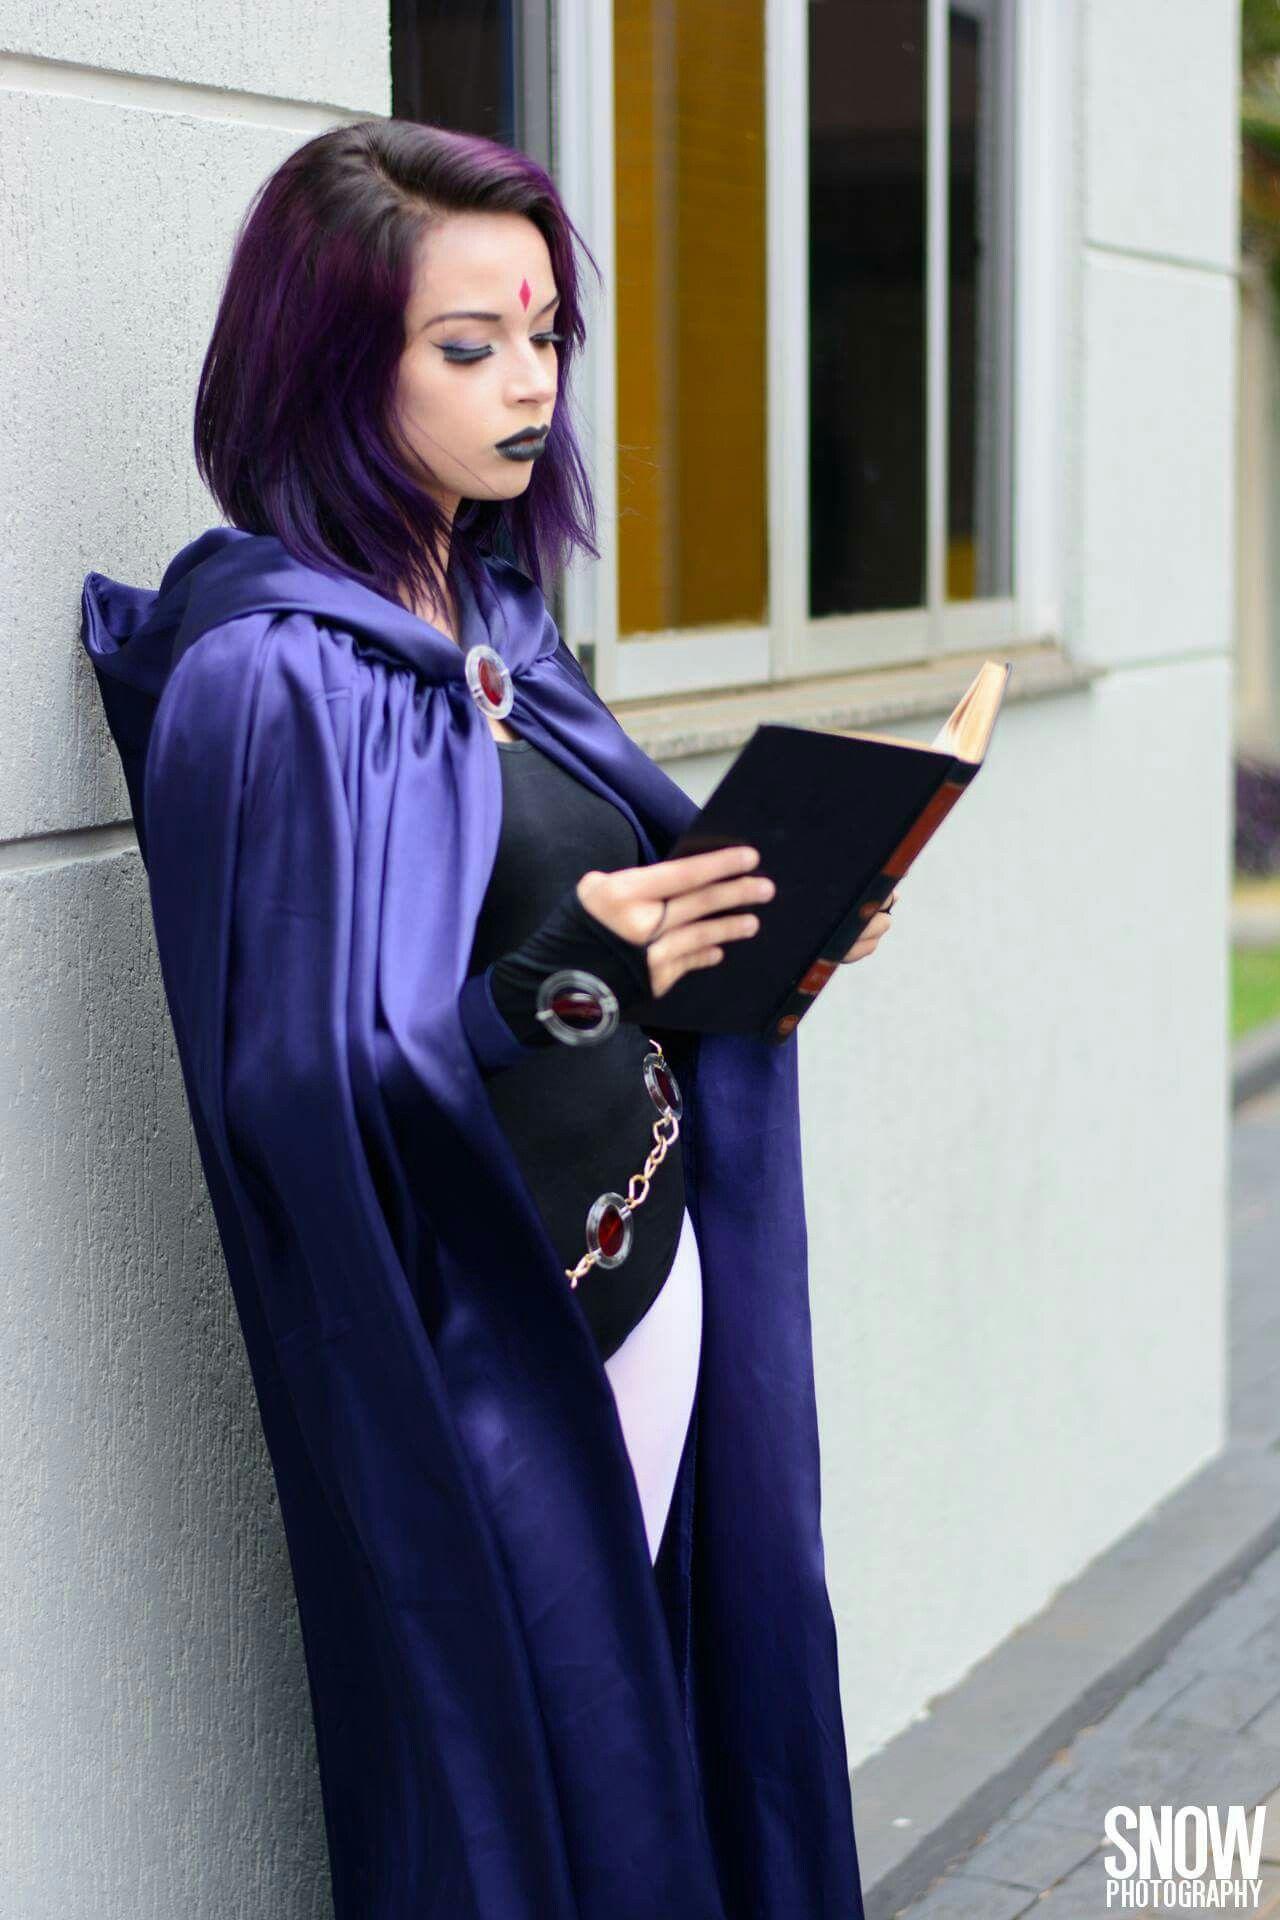 Raven cosplay, photo: Snow Photography https://m.facebook.com/snowpho/ Revana Jovens Titãs Teen Titans #cosplay #teentitans